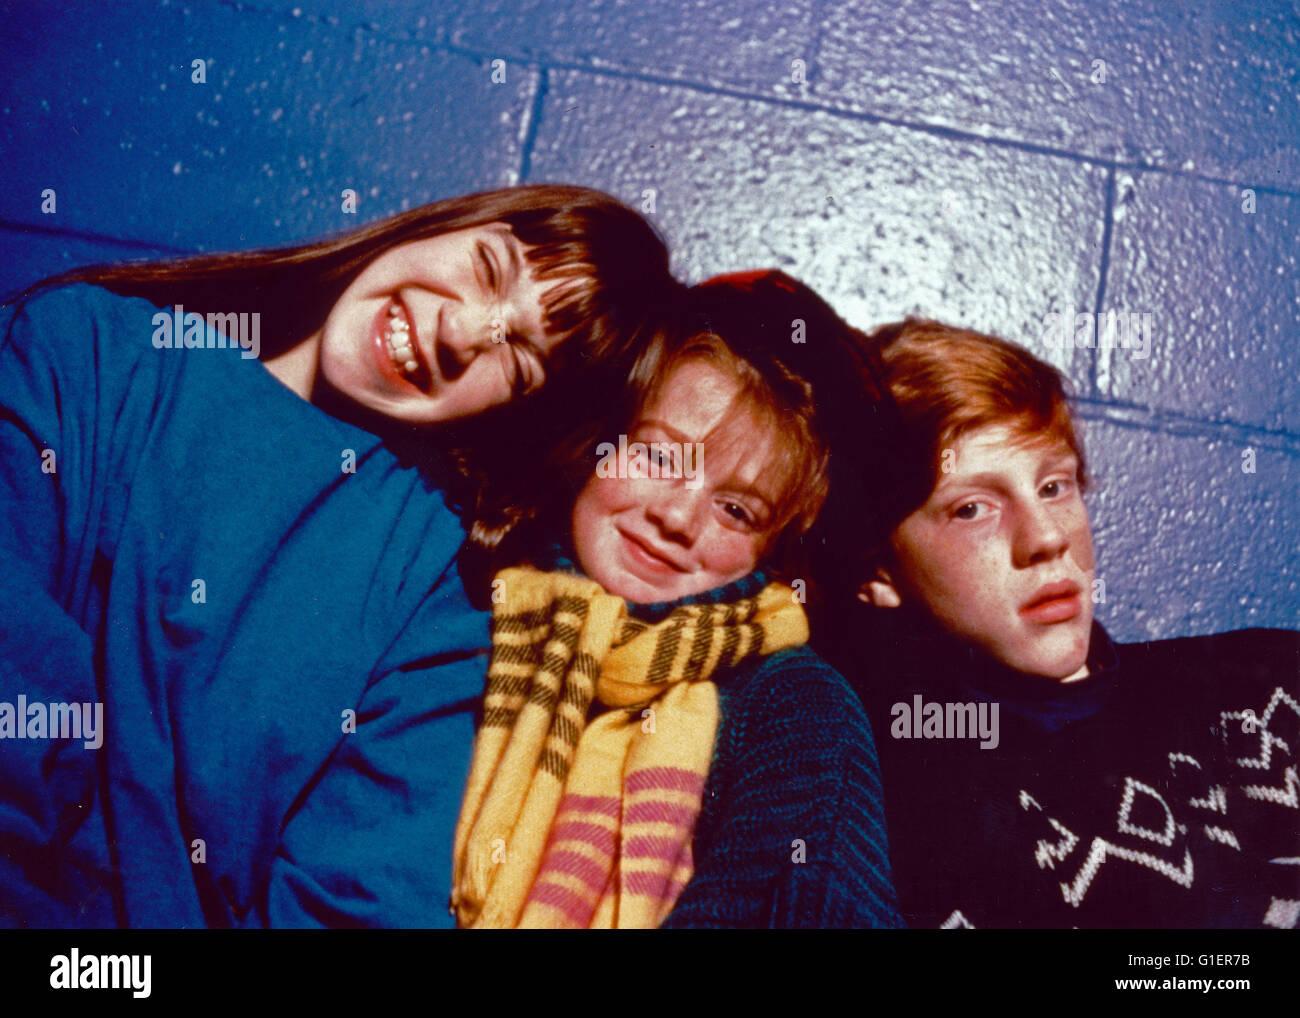 Pete & Pete, Realfilmserie, EUA 1993, Darsteller: Alison Fanelli, Mike Maronna, Danny Tamerelli Imagens de Stock